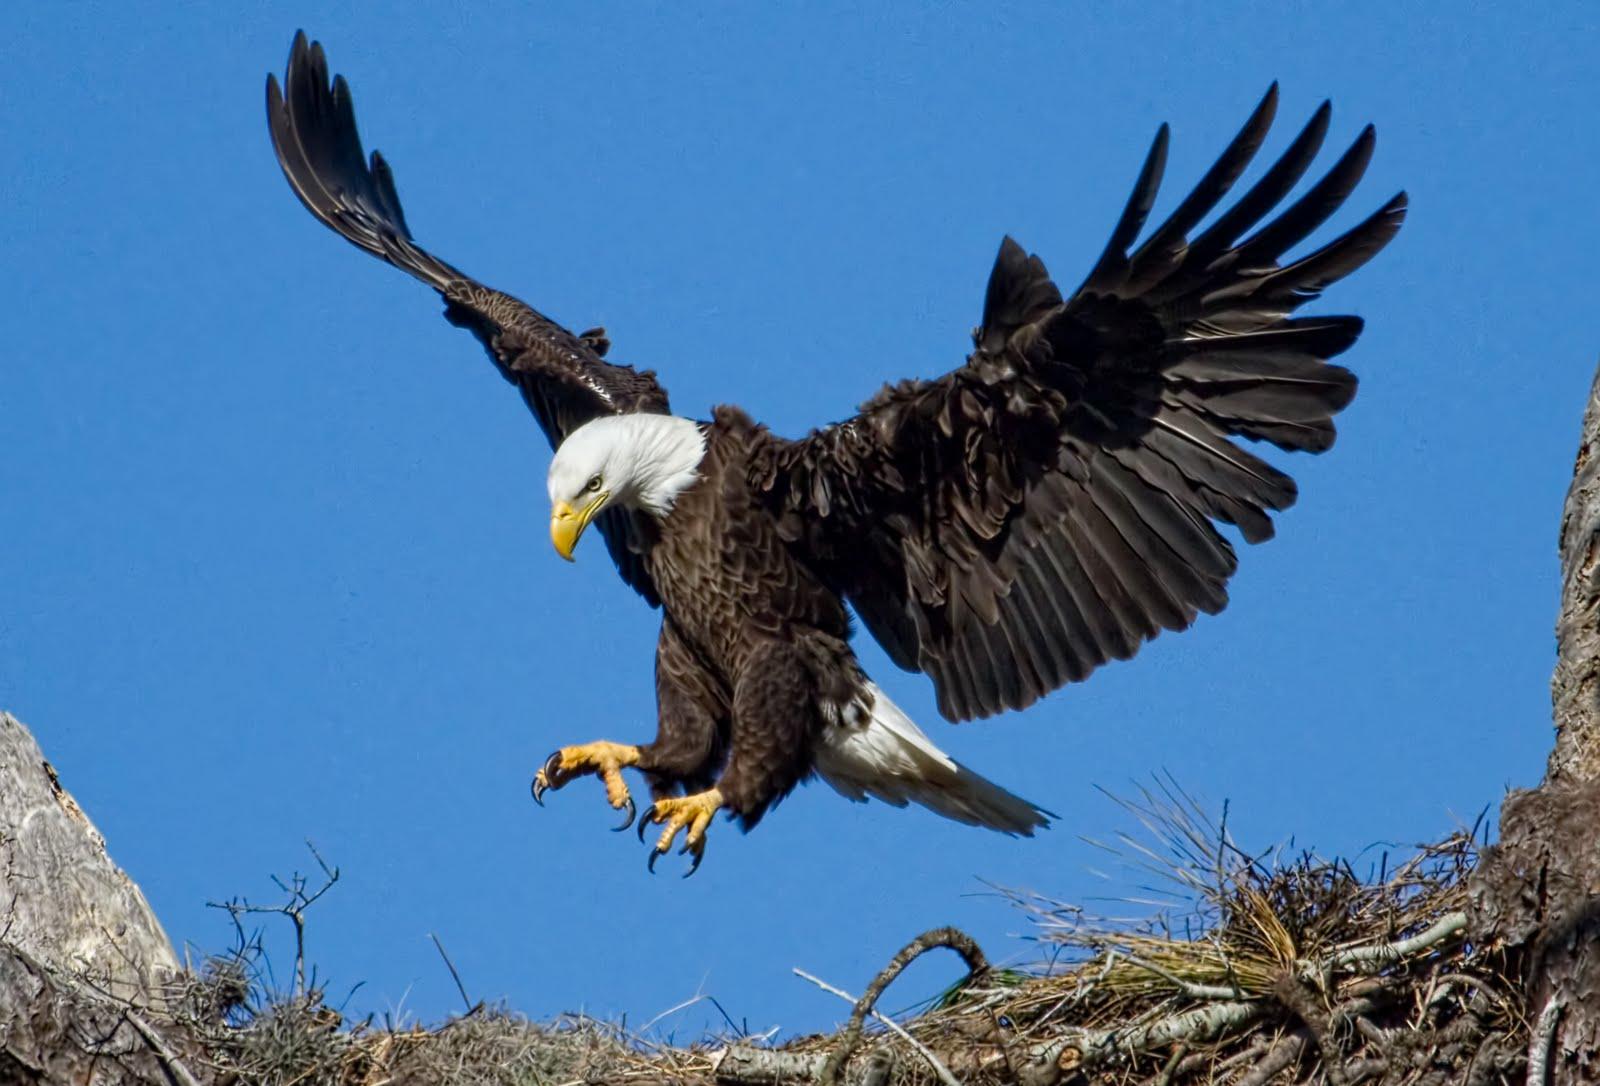 HD-eagle-pictures-ile-ilgili-g%C3%B6rsel-sonucu-wallpaper-wp5601050